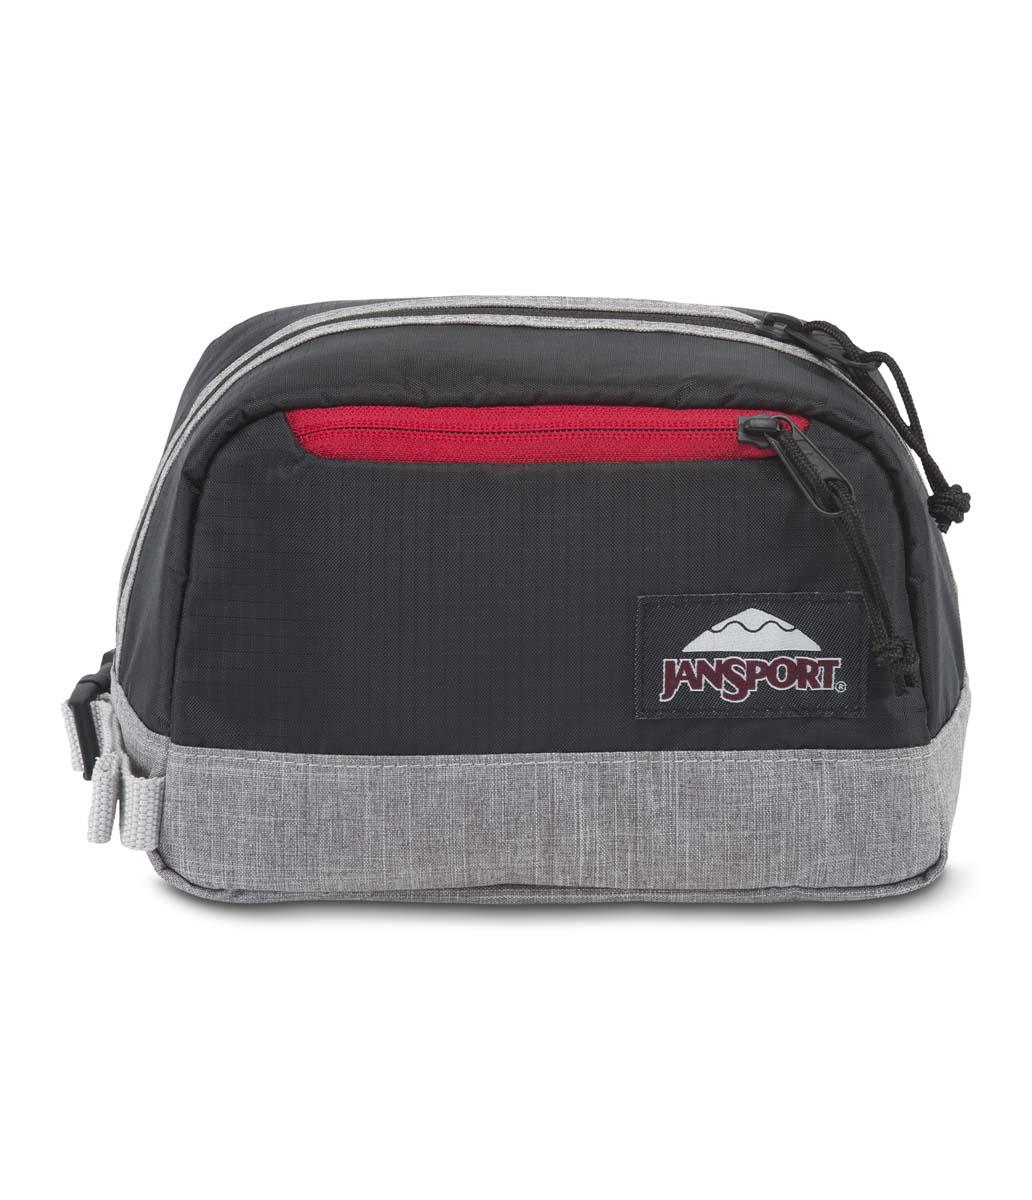 JanSport กระเป๋าเป้ รุ่น Dopp kit LD - Black Poly Ripstop/Grey Marl